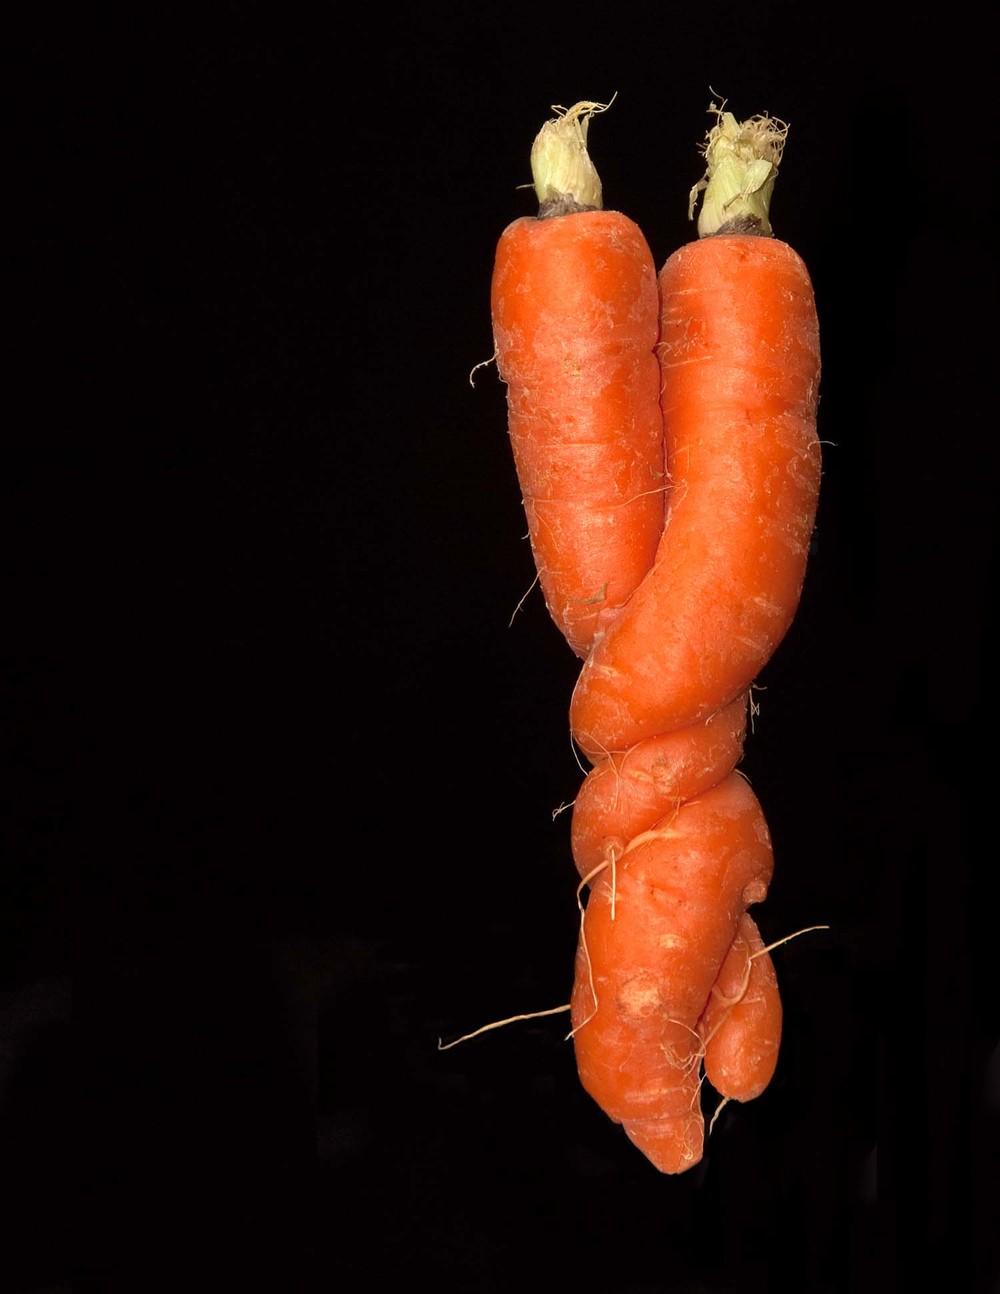 Loving Carrots